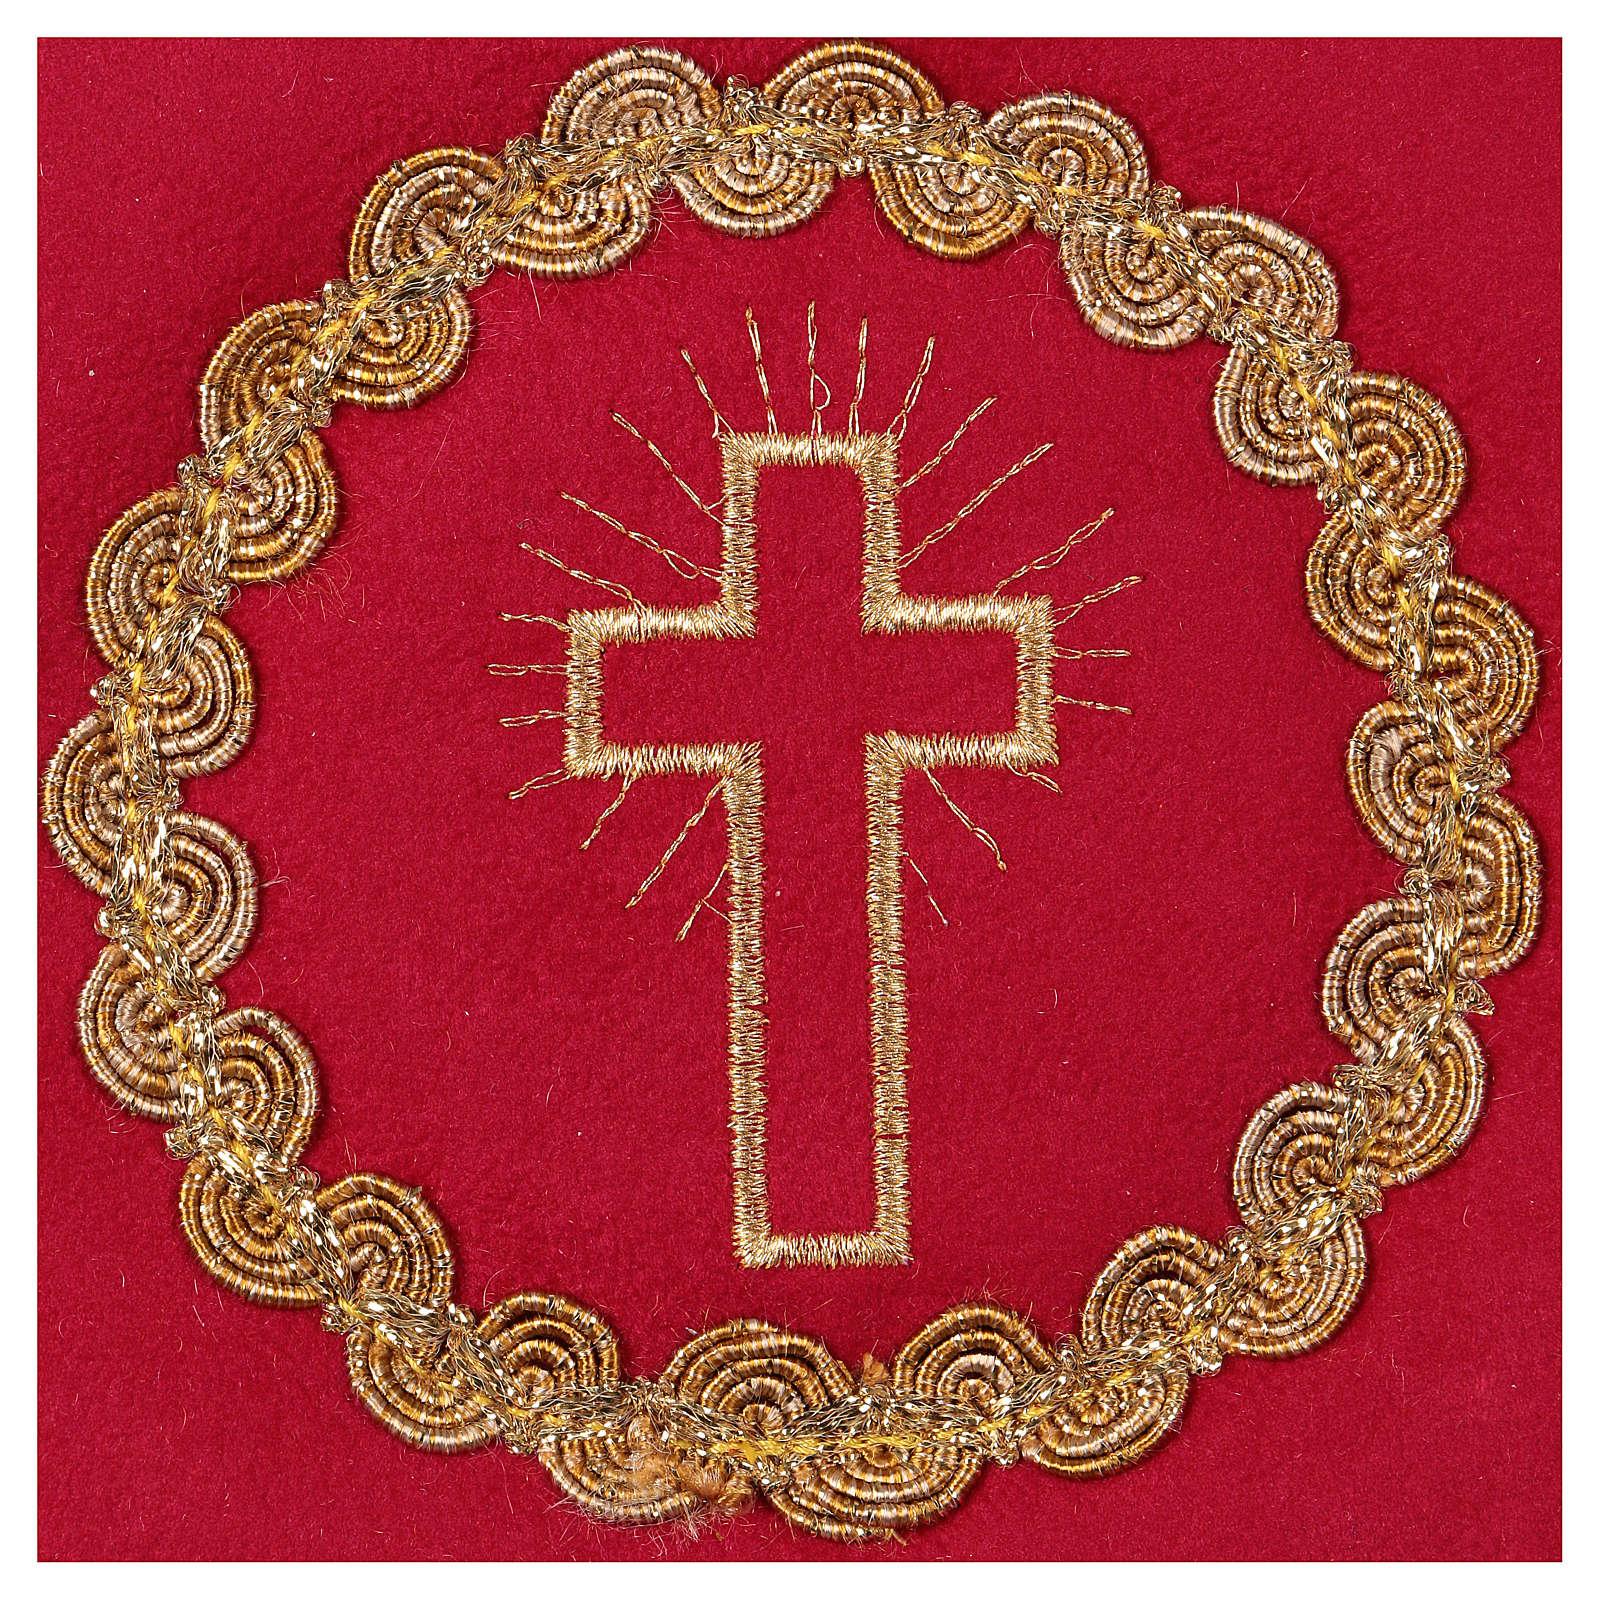 Cubre cáliz cruz tejido rojo 4